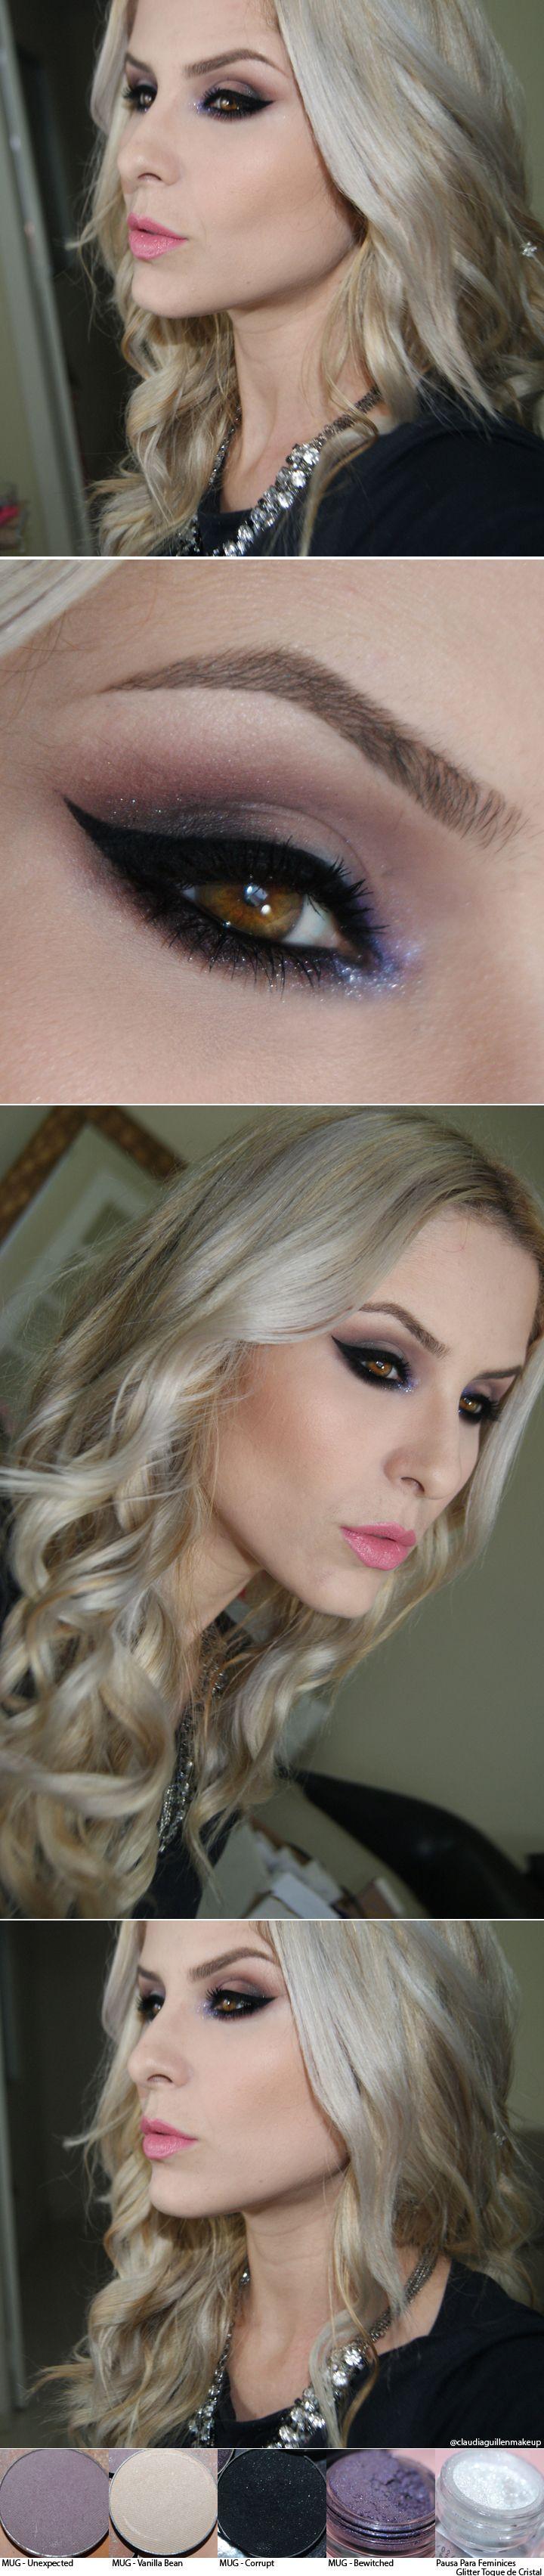 Make Bewitched com sombras e pigmento Make up Geek http://instagram.com/claudiaguillenmakeup http://claudiaguillen.inbloodesign.com/